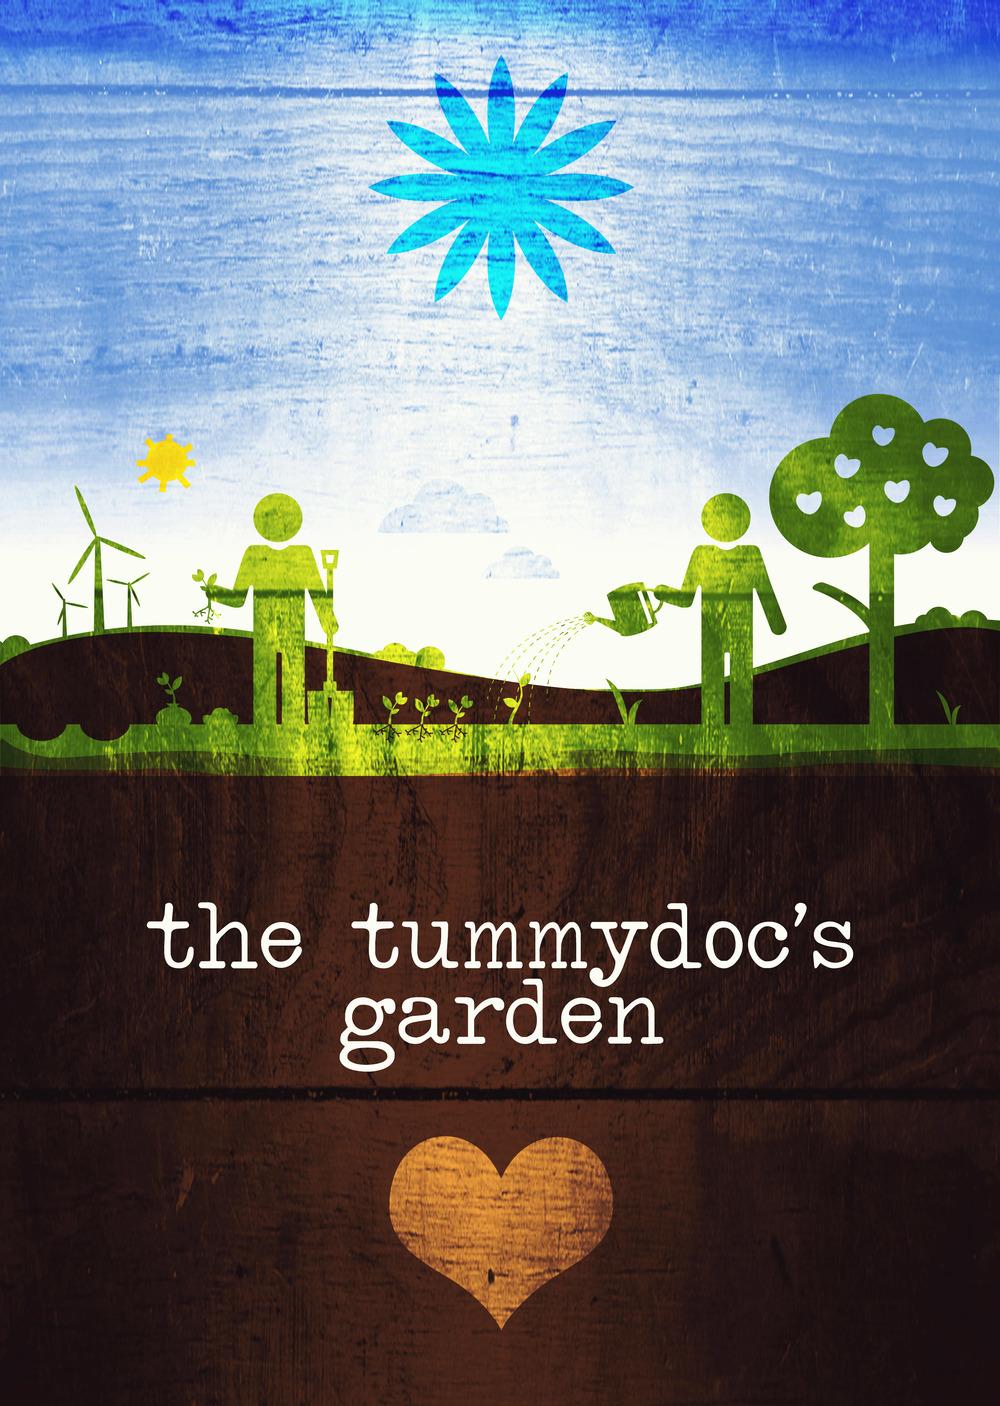 tummydocs garden main pic.jpg